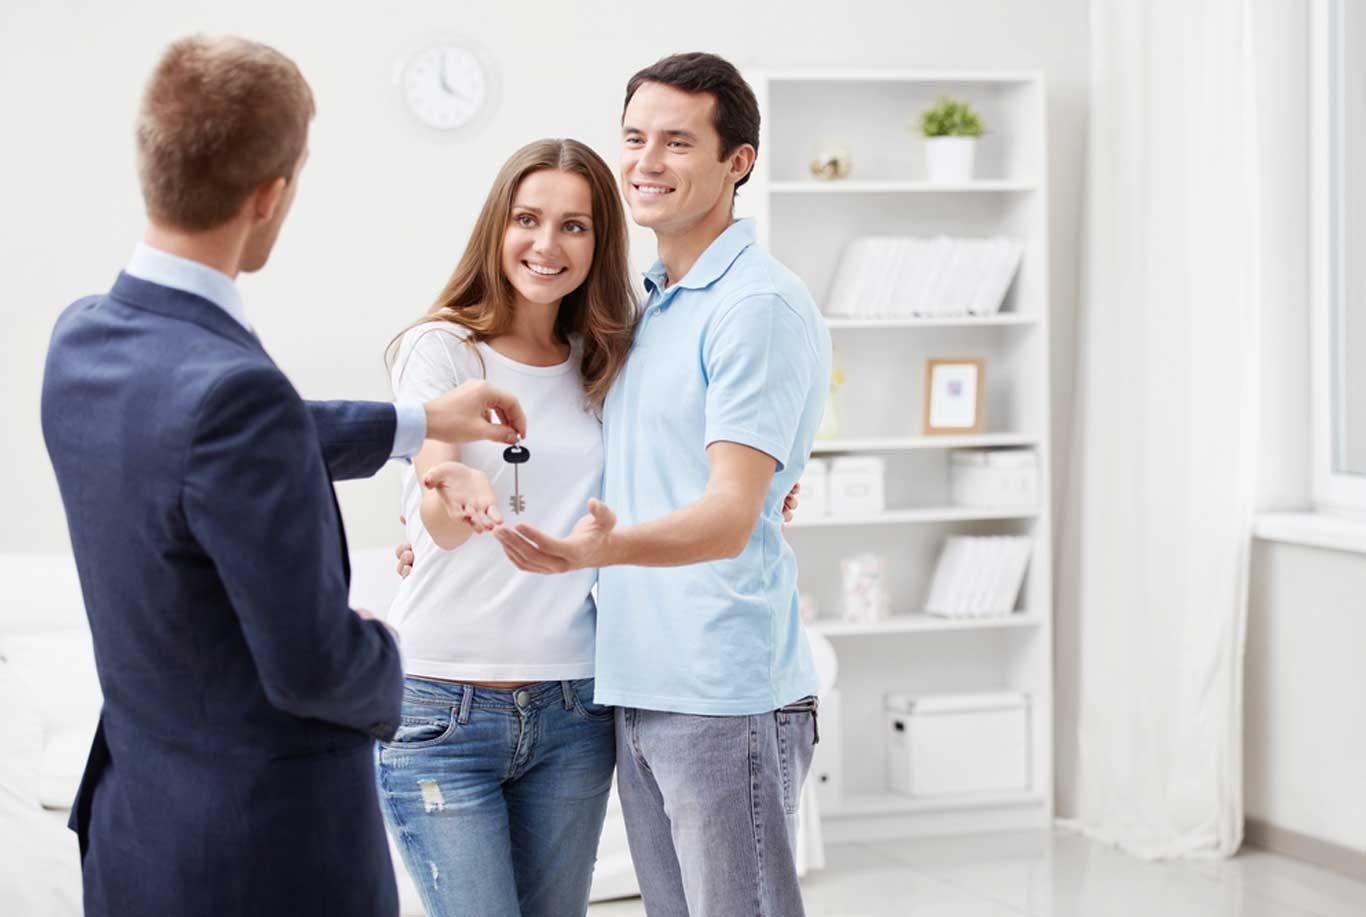 Картинки по запросу Приобретение недвижимости через агентство: преимущества